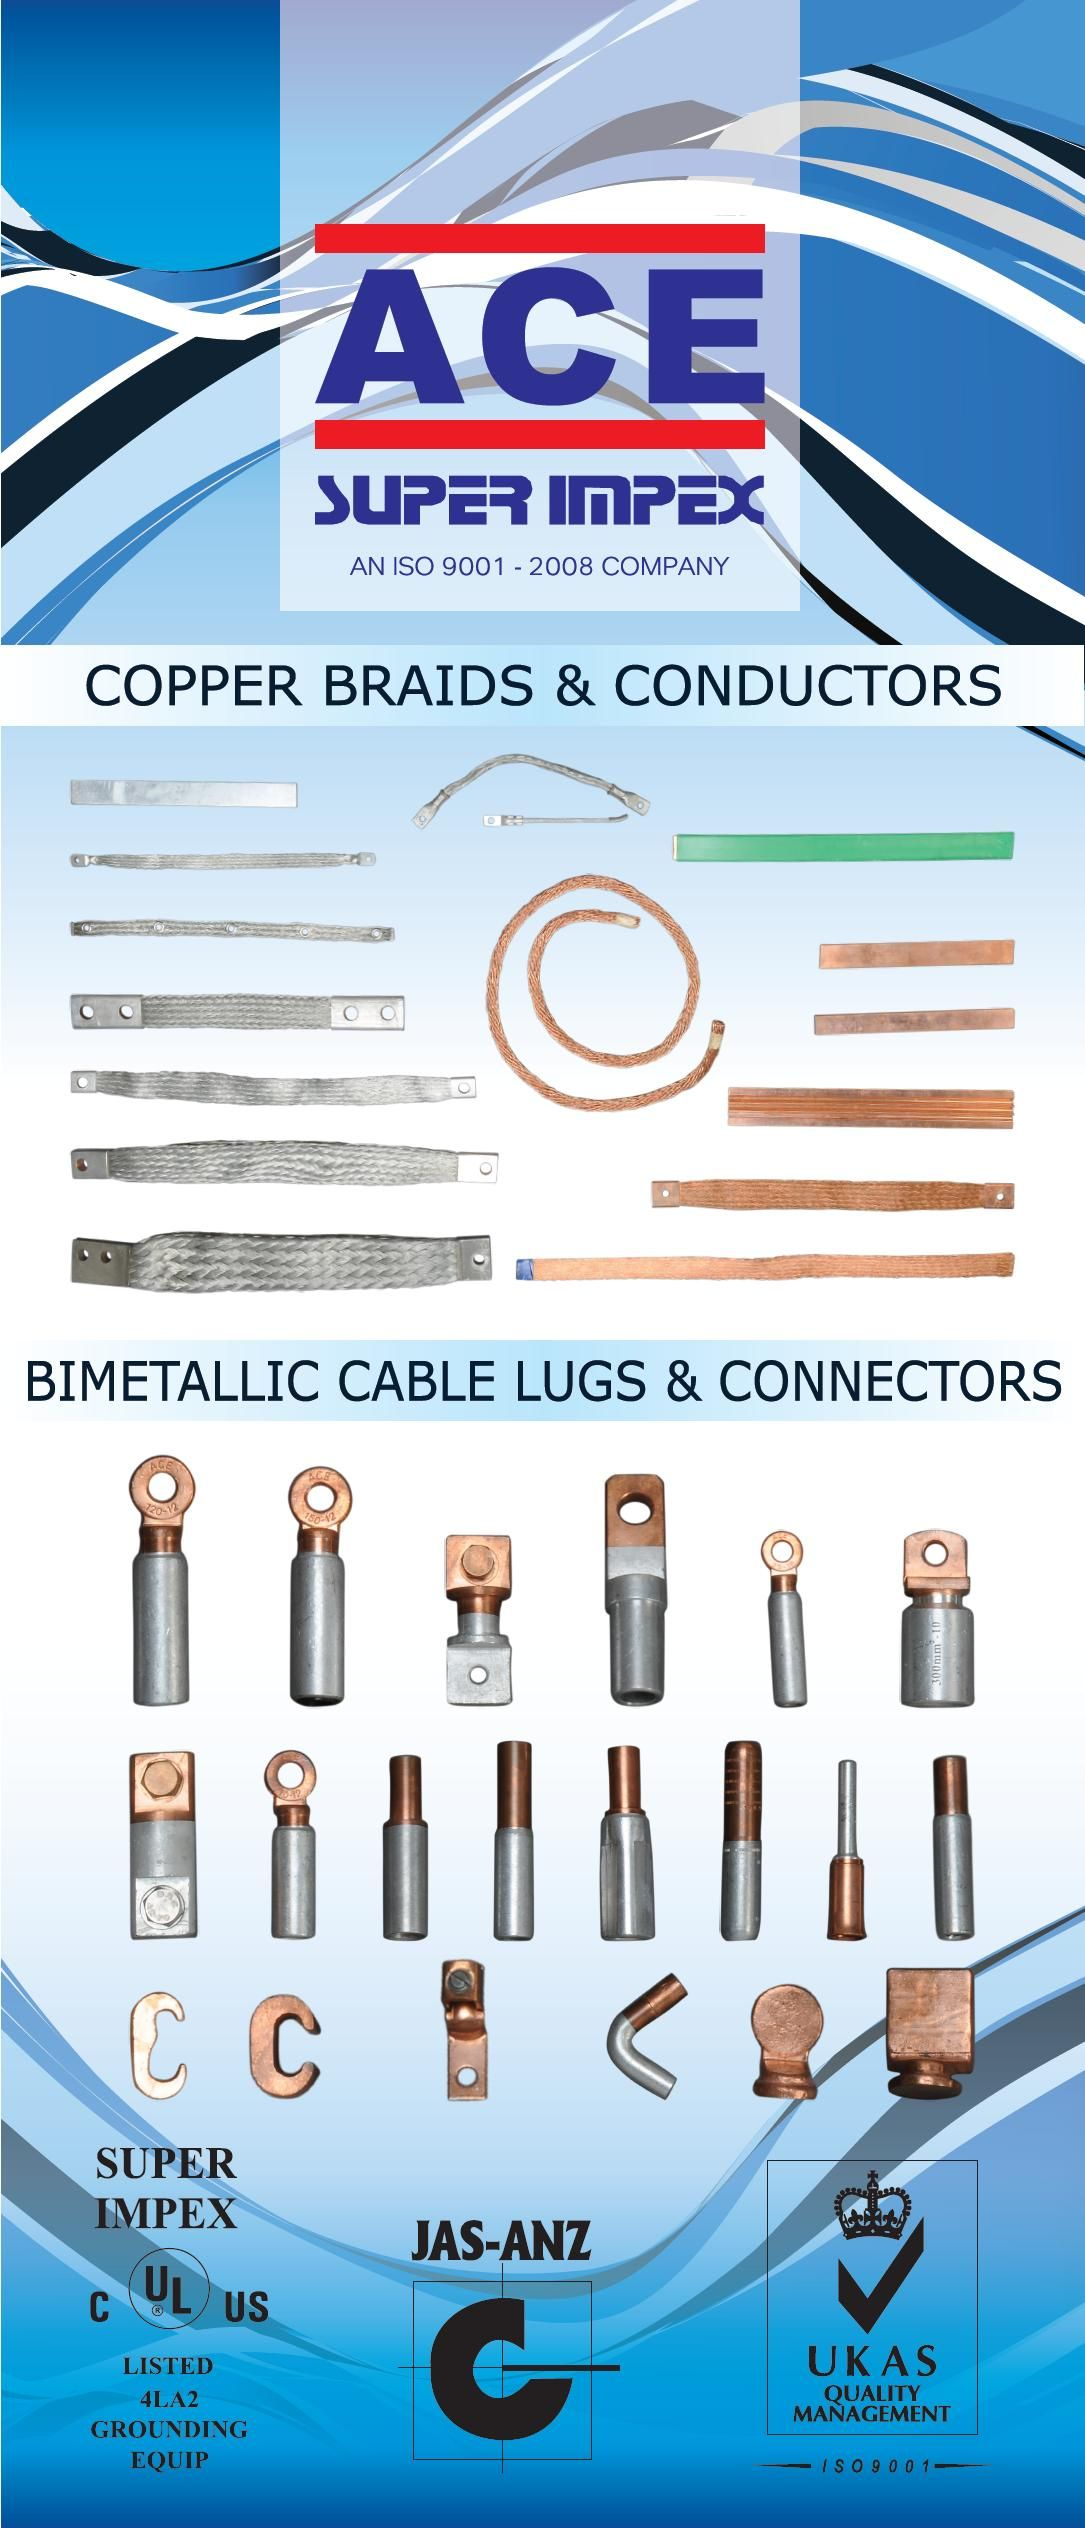 #flatbraids #roundbraids #flexibleconnectors #compressedconductors #conductingtape #flexiblestrandedropes #roundbraids #transformers